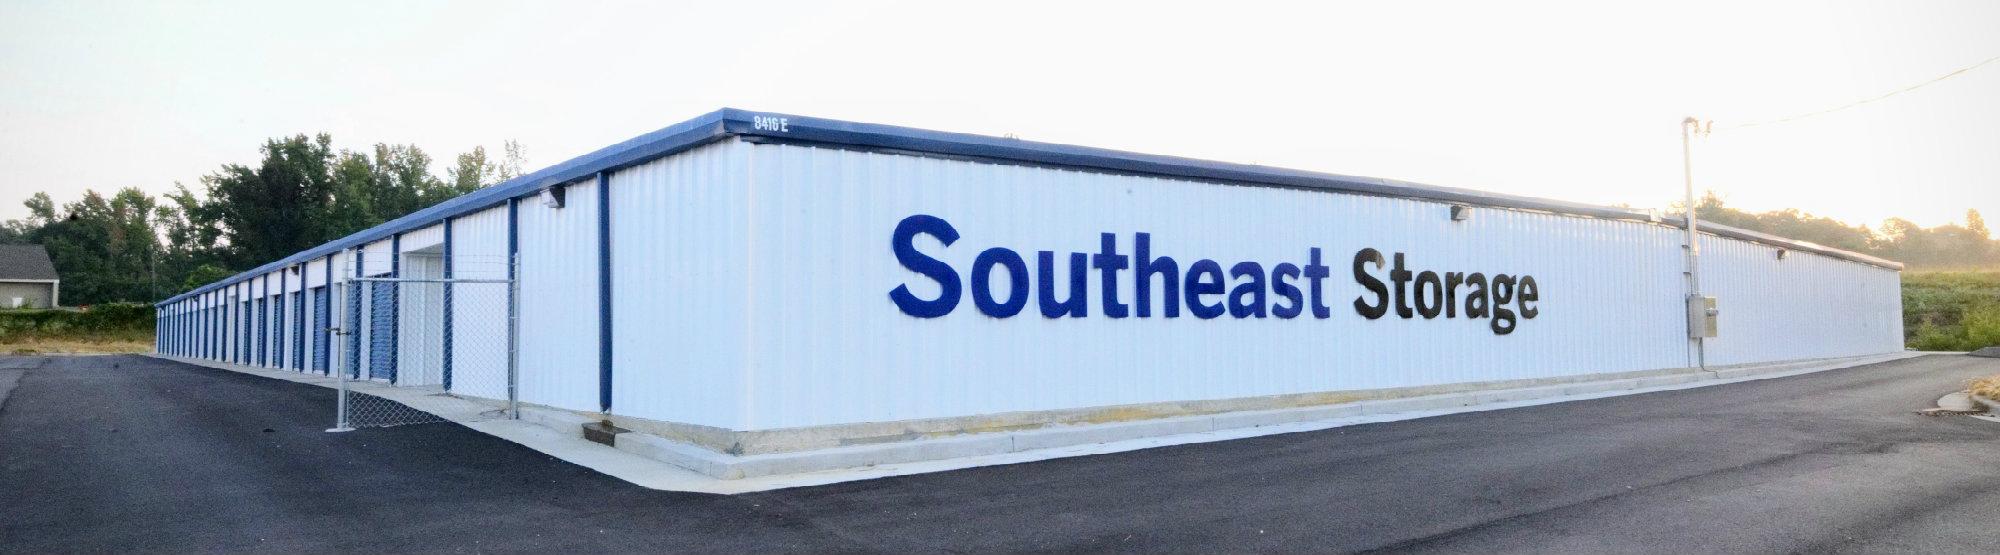 Southeast Storage